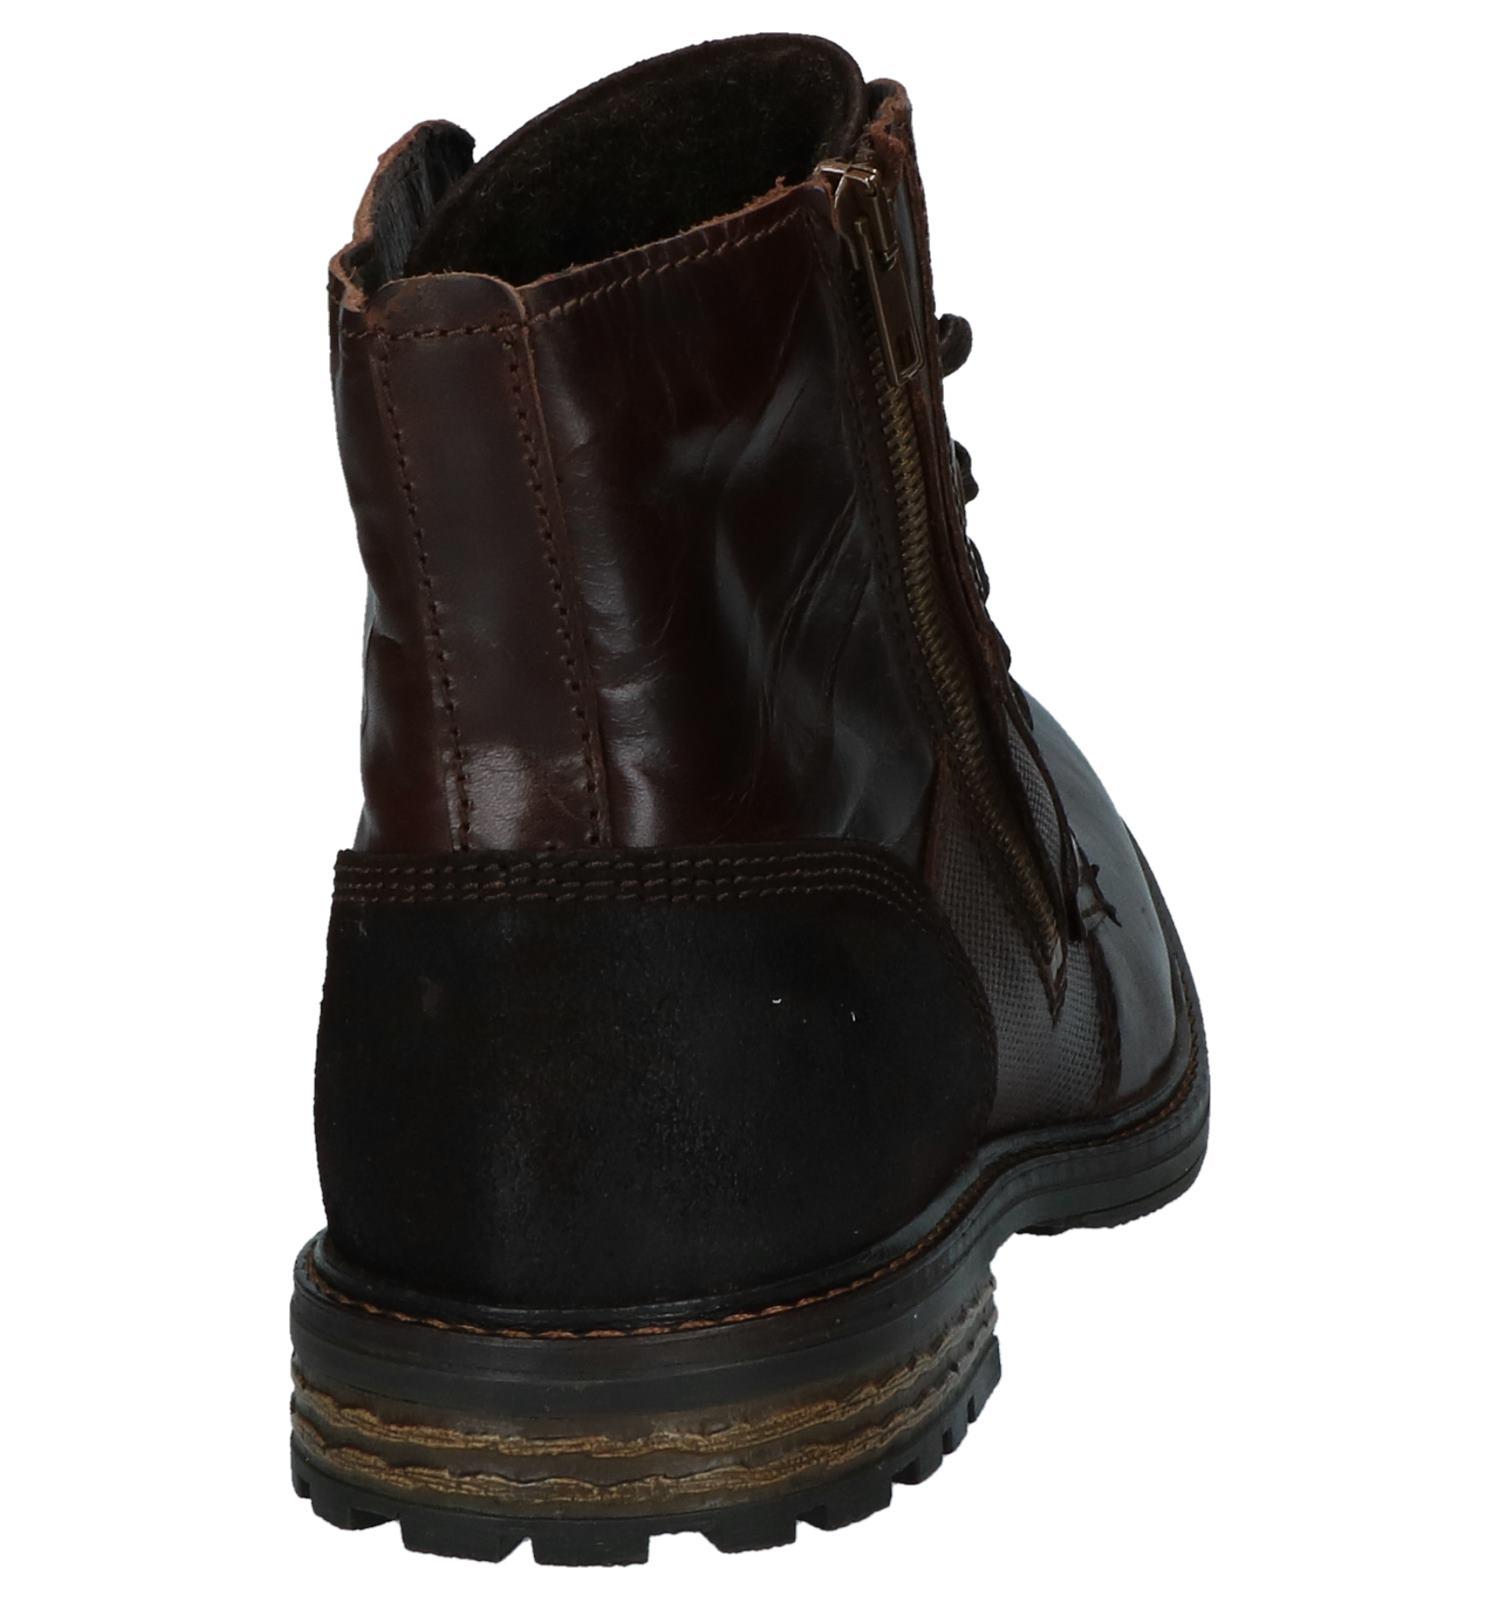 River Boots Kola Woods Donkerbruine Kola Donkerbruine River Woods Boots JK1FTlc